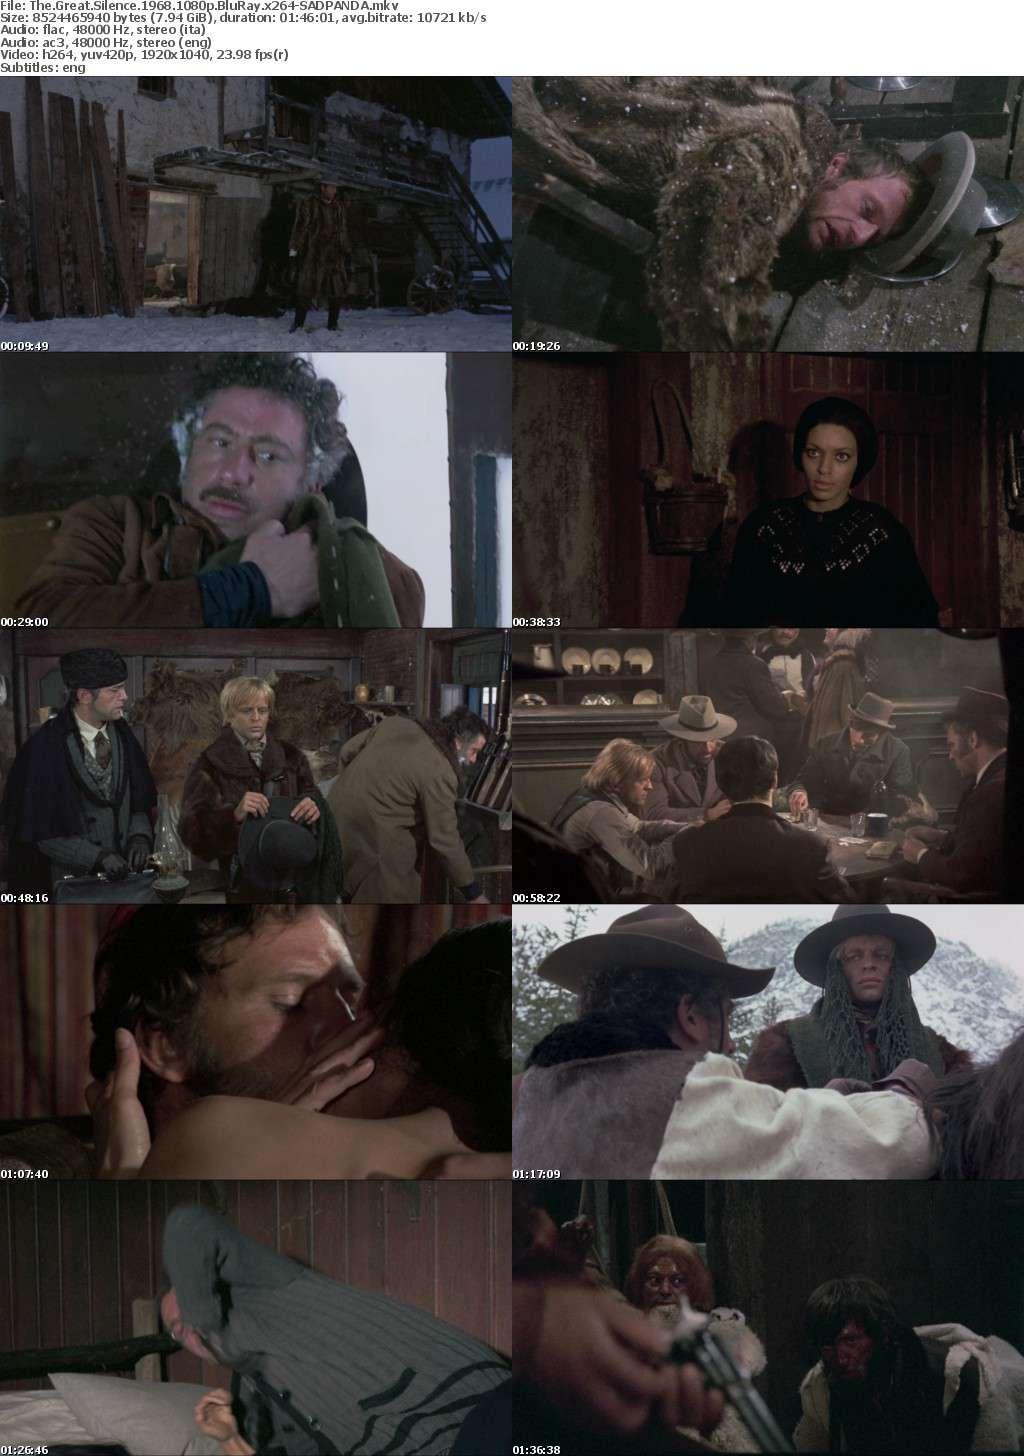 The Great Silence 1968 1080p BluRay x264-SADPANDA